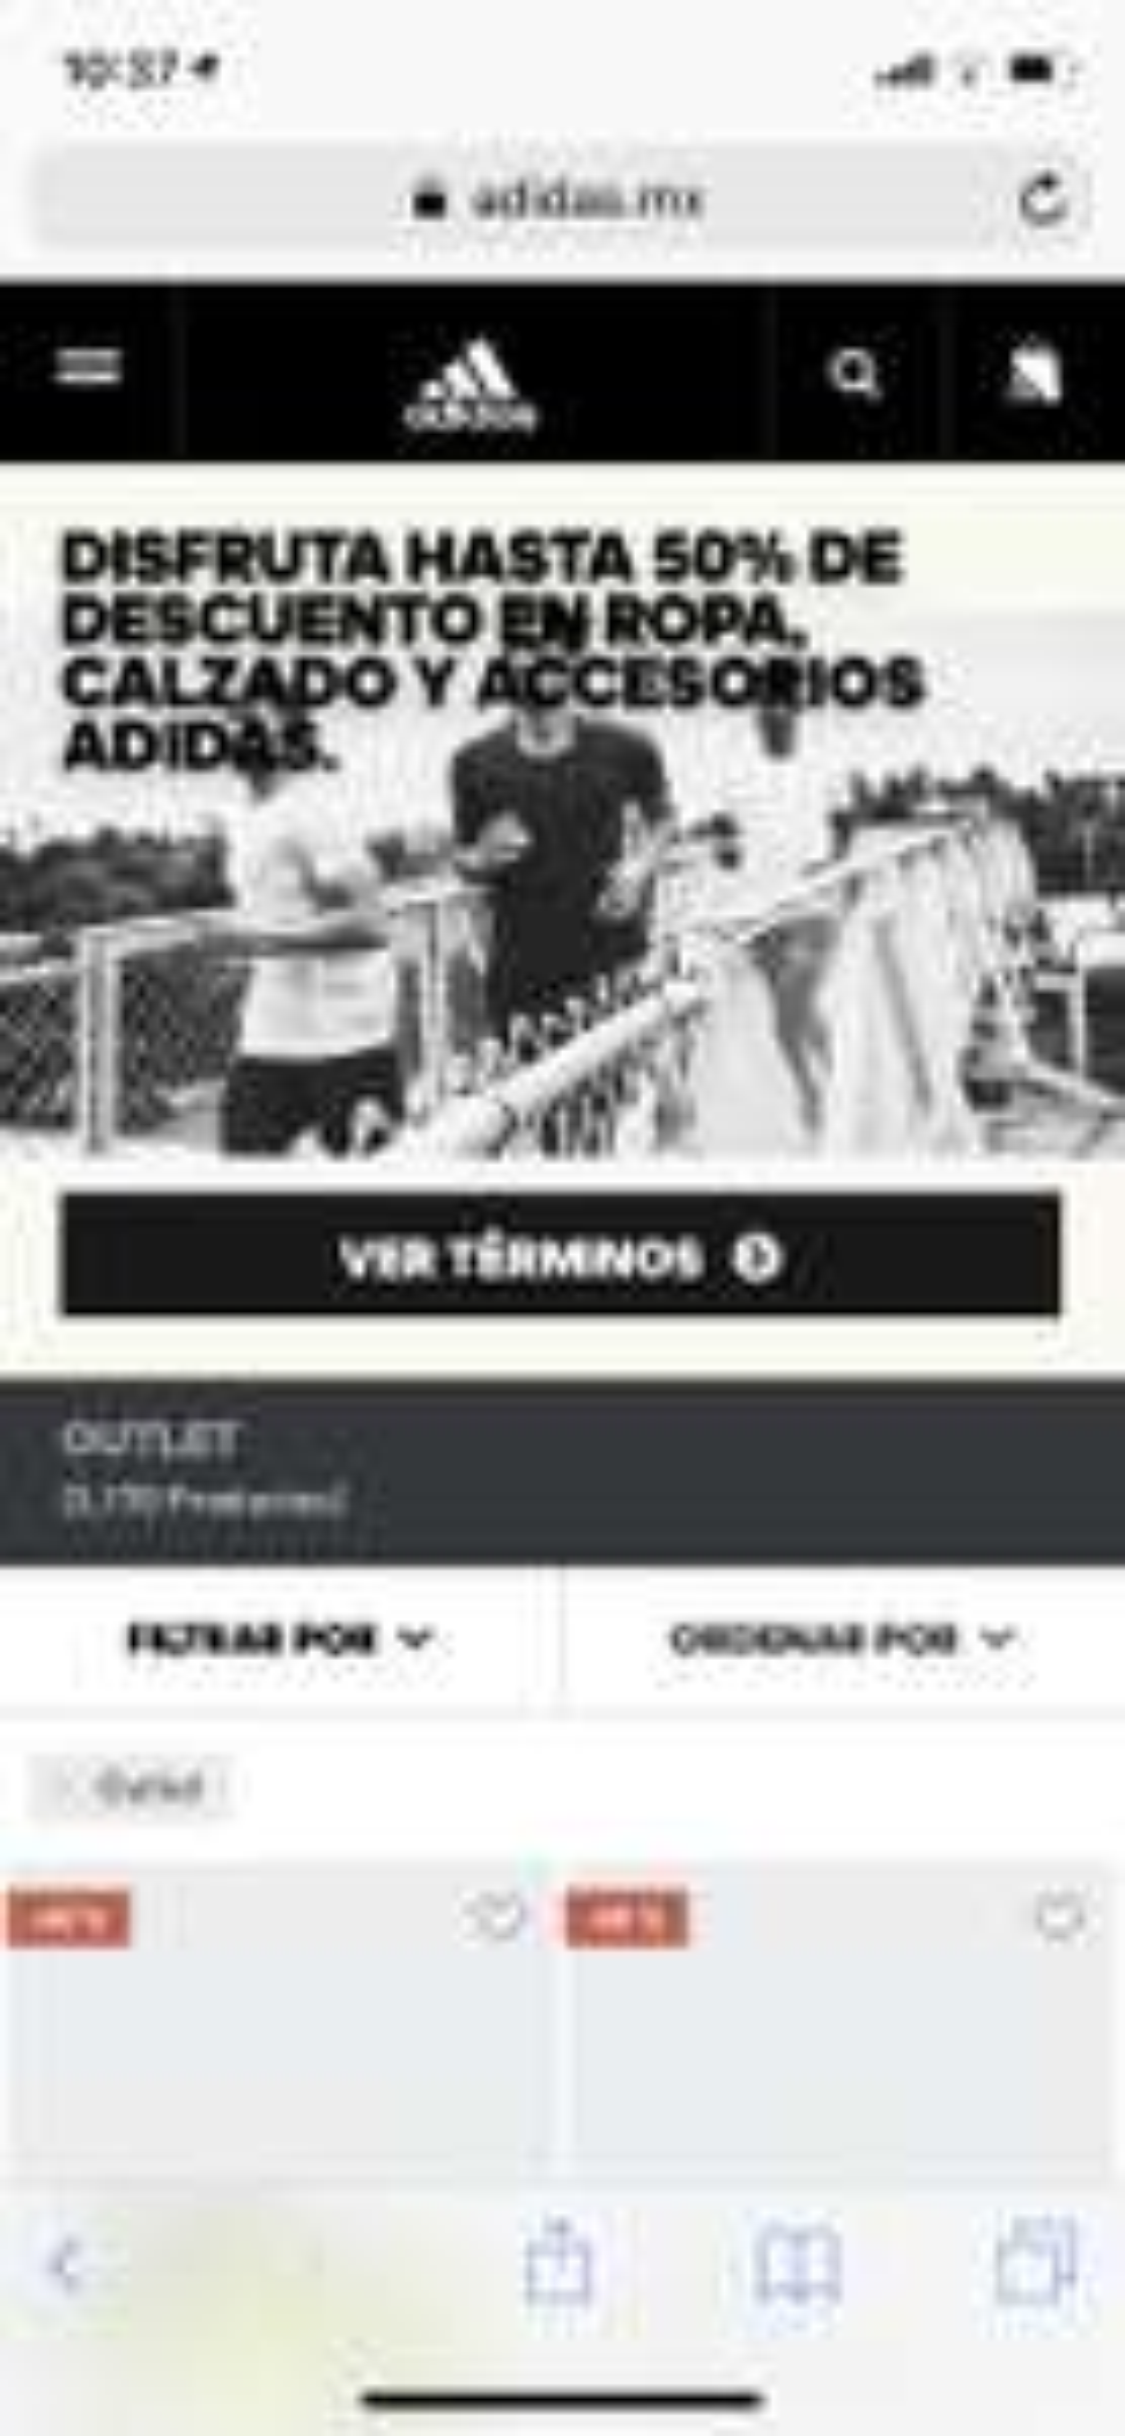 Adidas: Outlet adidas con hasta 50% + 20%